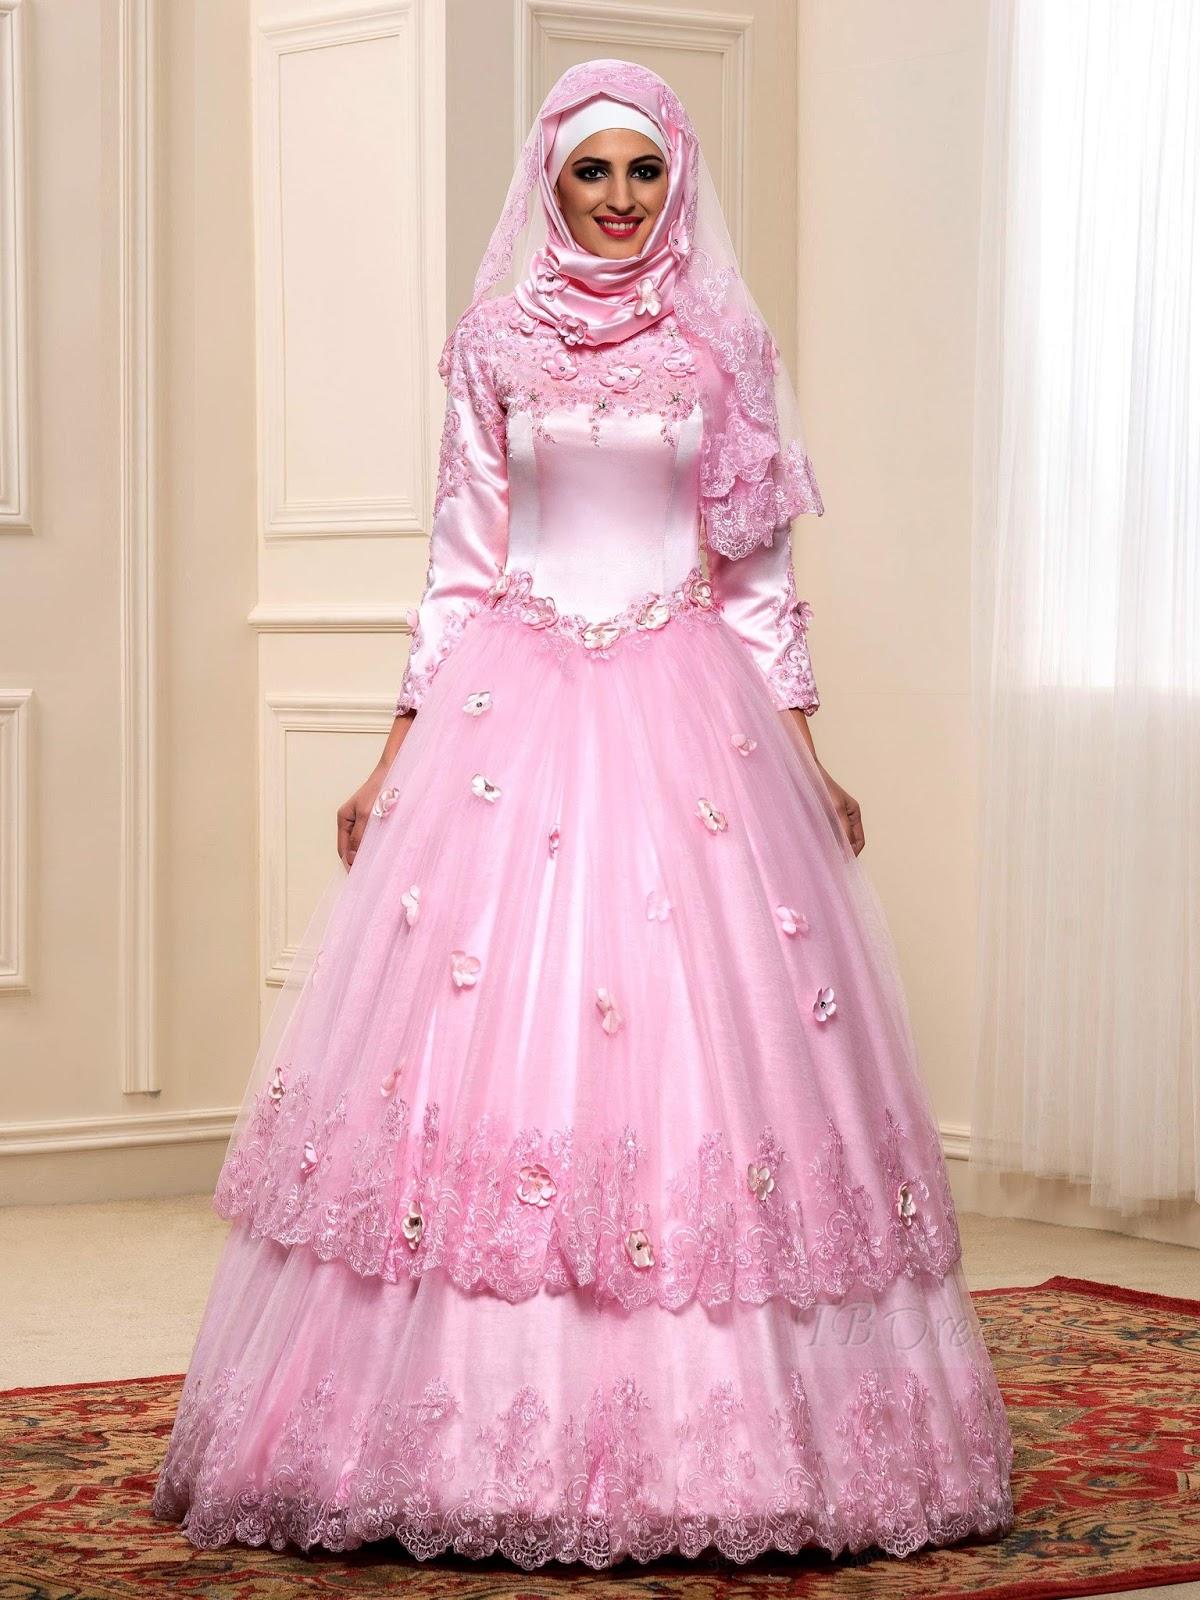 12 Gaun Pengantin Muslim Modern Terbaru gebeet com